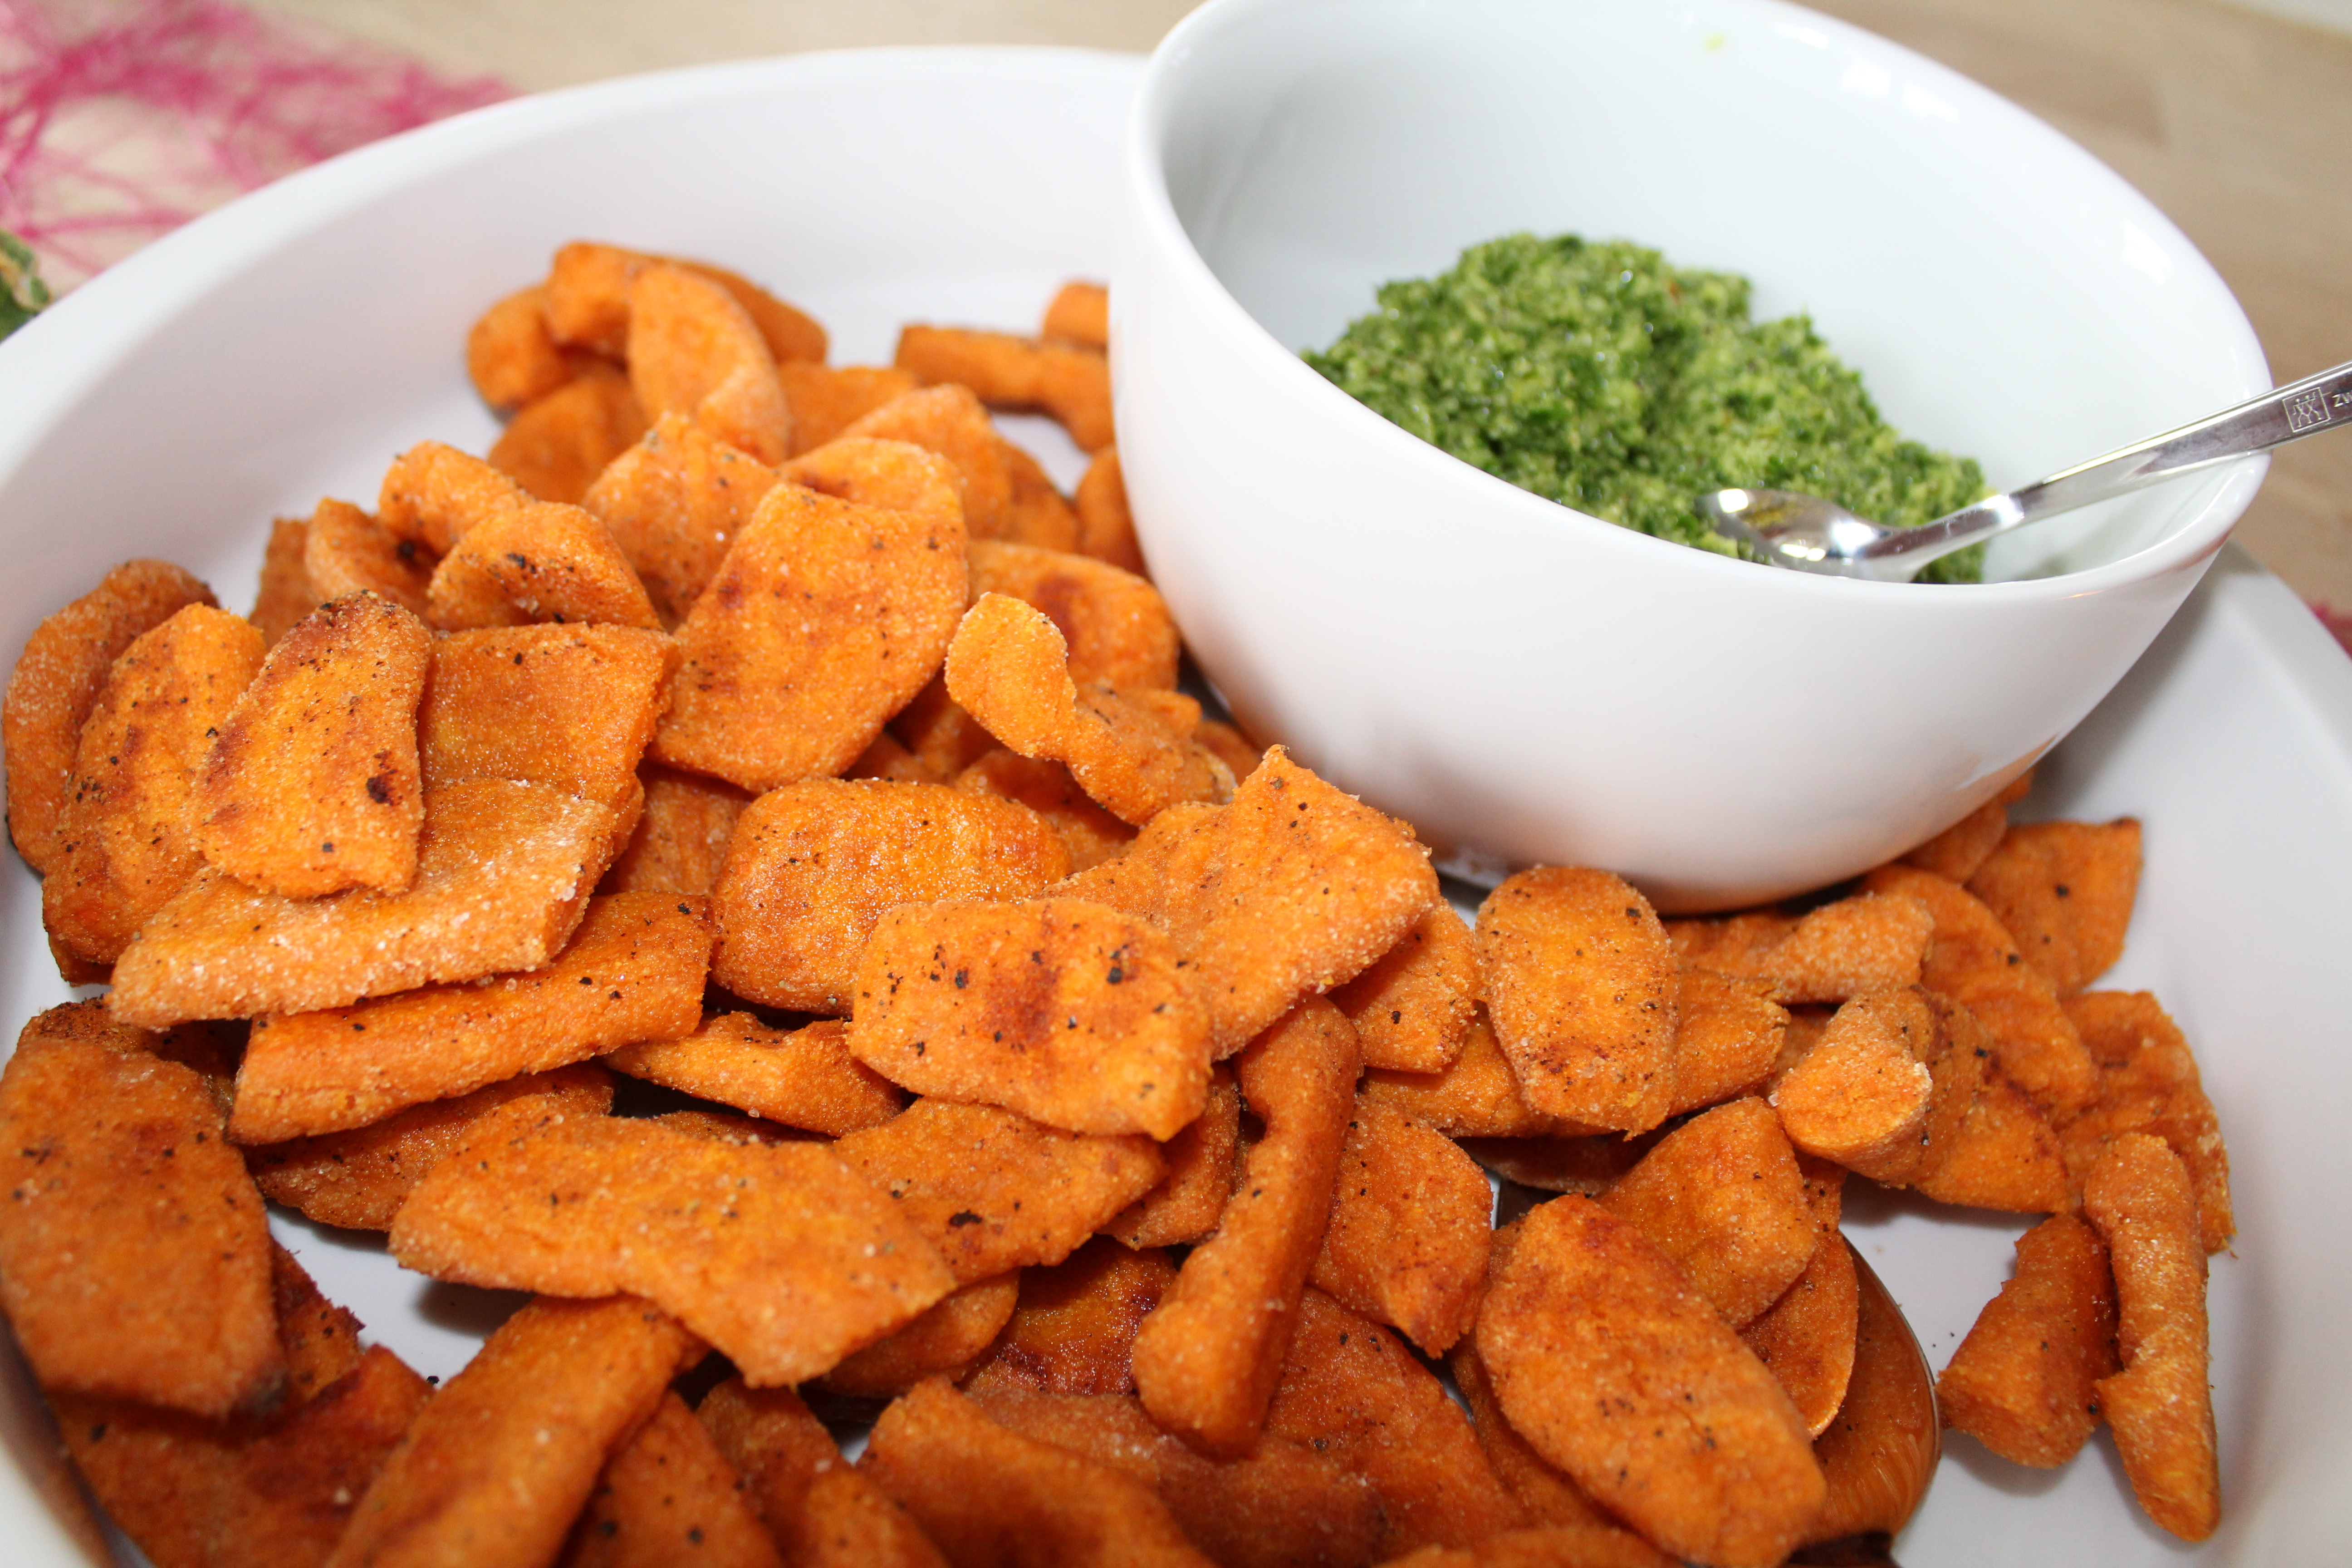 Gnozzi af søde kartofler og grønkålspesto